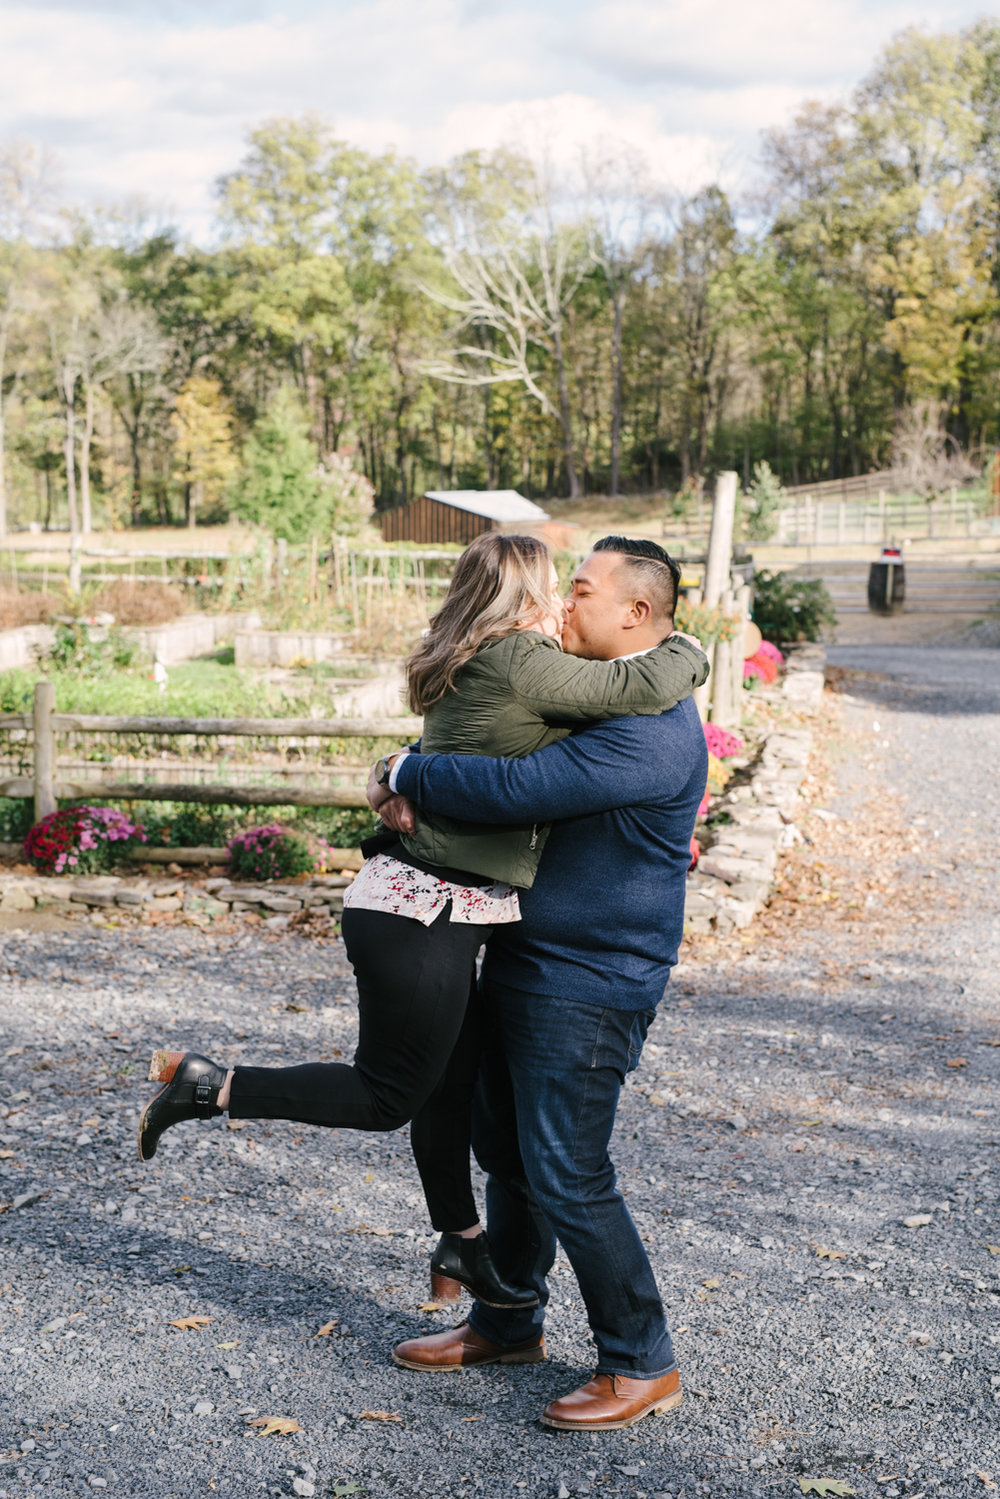 Warwick Winery Engagement Session- Diana+Jon- Fall Engagement Photos- New York- Olivia Christina Photo-61.jpg